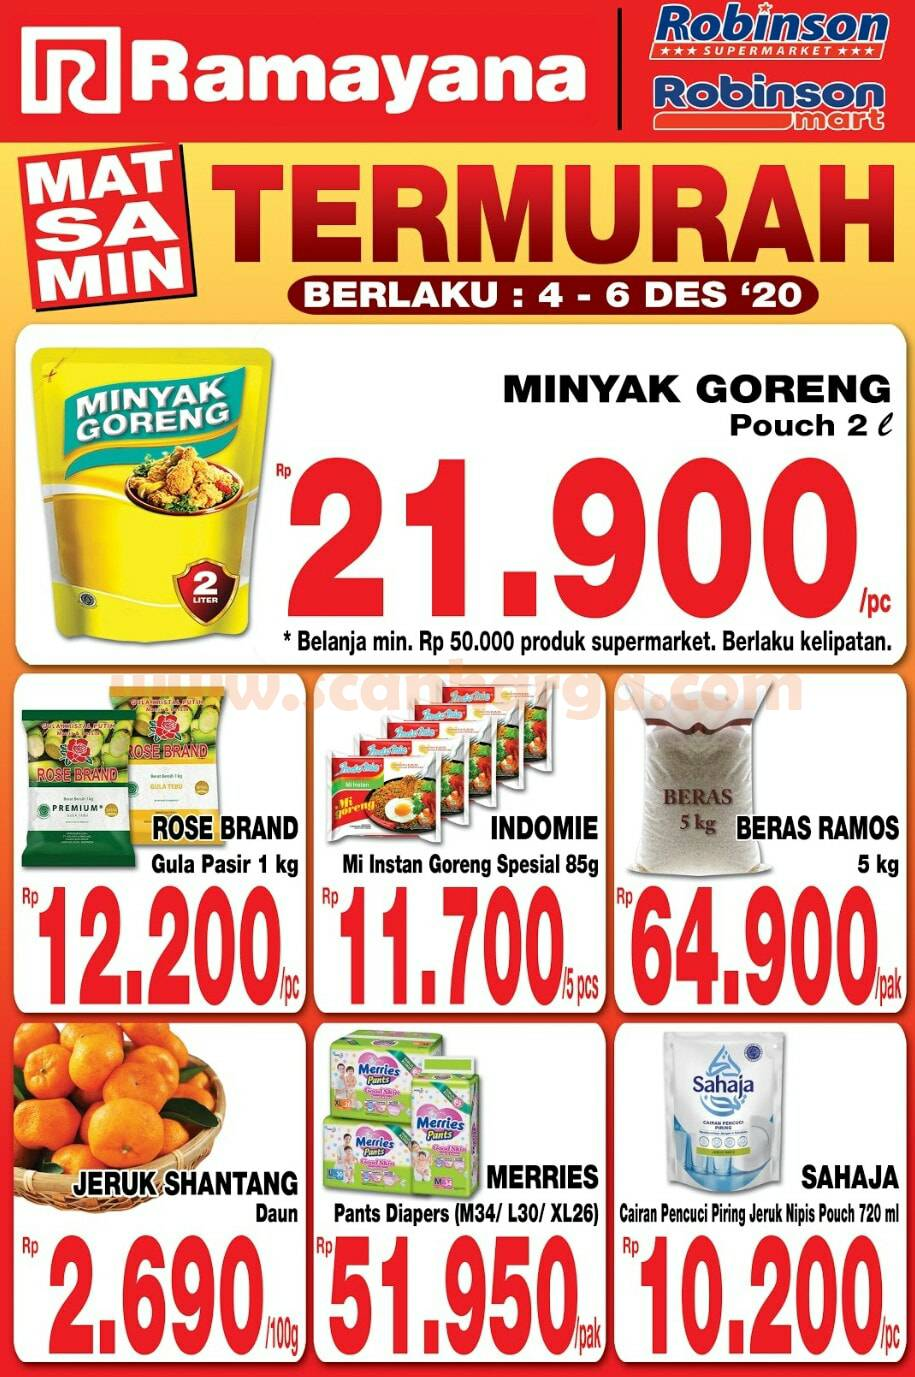 Katalog Promo Robinson Mart Supermarket Terbaru 4 - 6 Desember 2020